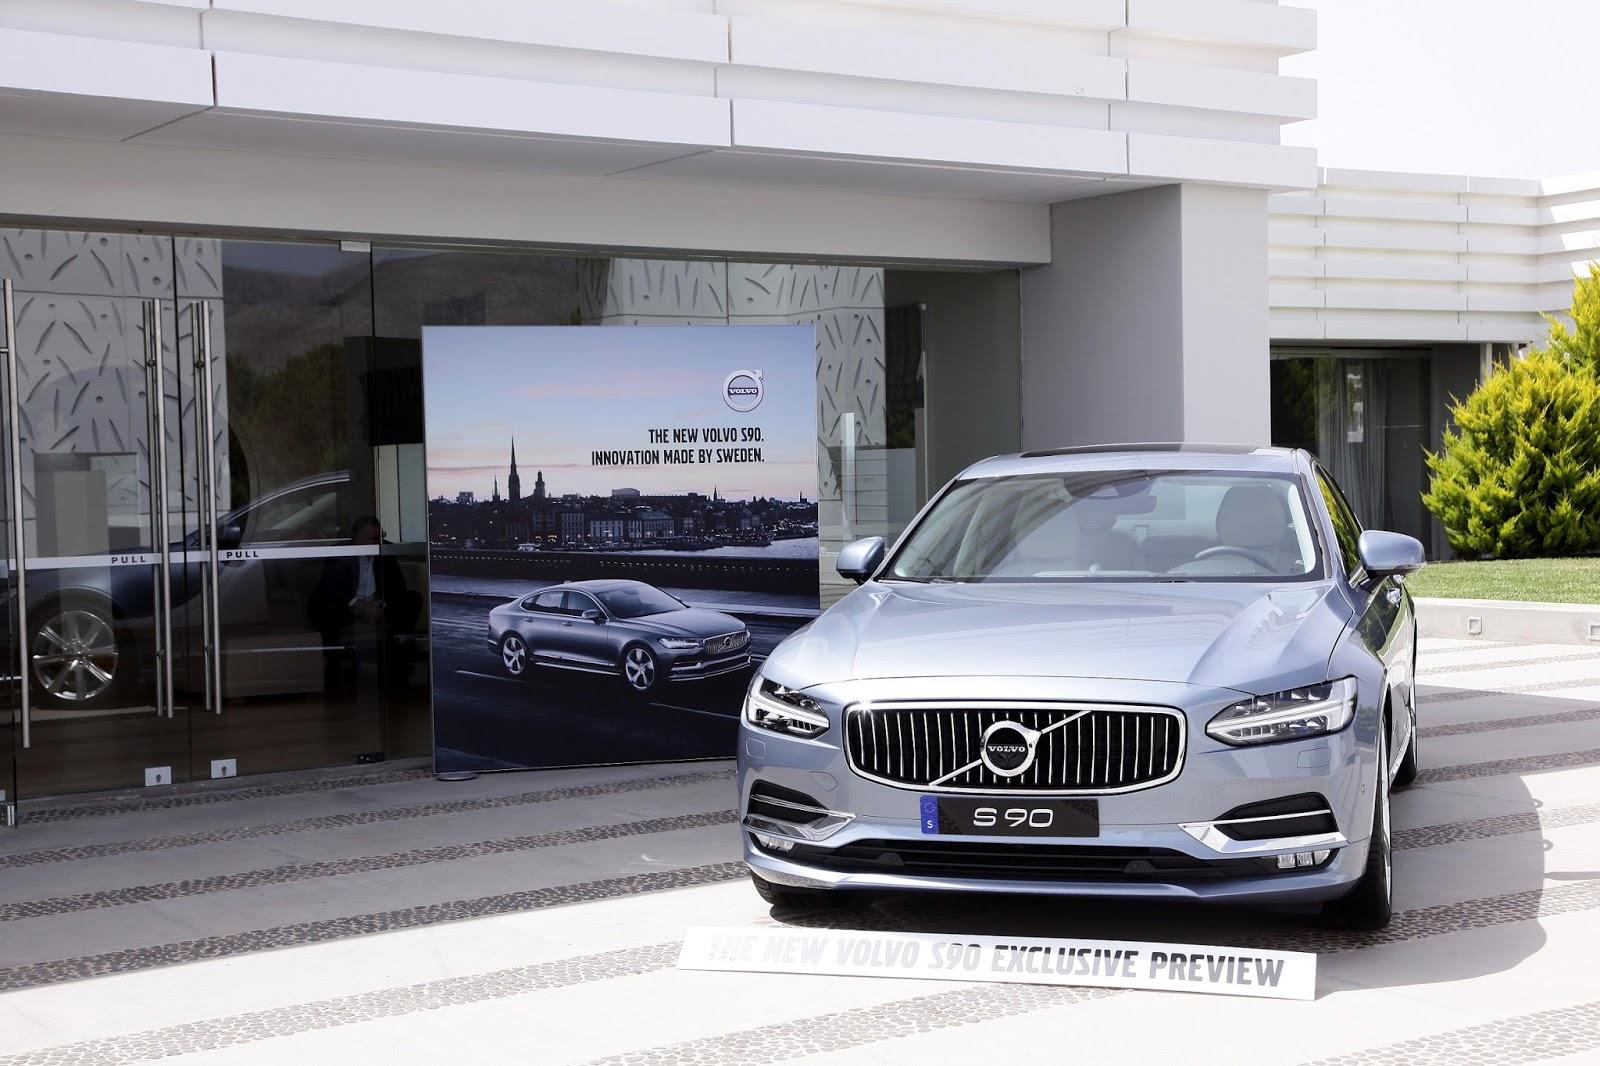 NEO2BVOLVO2BS902B2540EASE 1 Το Νέο Volvo S90 ήταν ο μεγάλος guest star στο συνέδριο ηγεσίας της ΕΑΣΕ Luxury, Luxury sedan, sedan, Volvo, Volvo S90